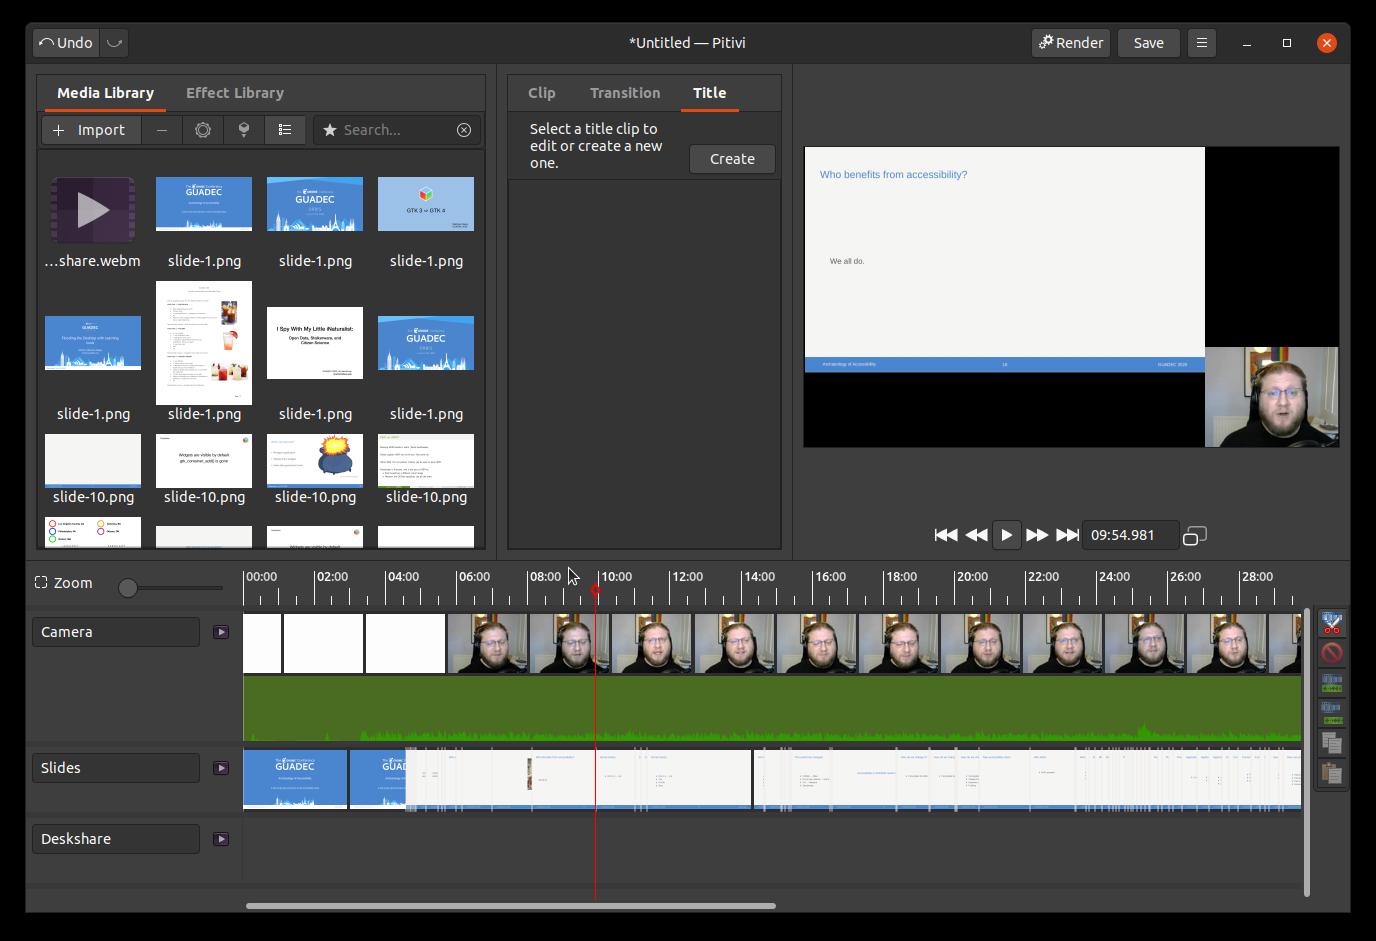 screenshot of Pitivi video editor